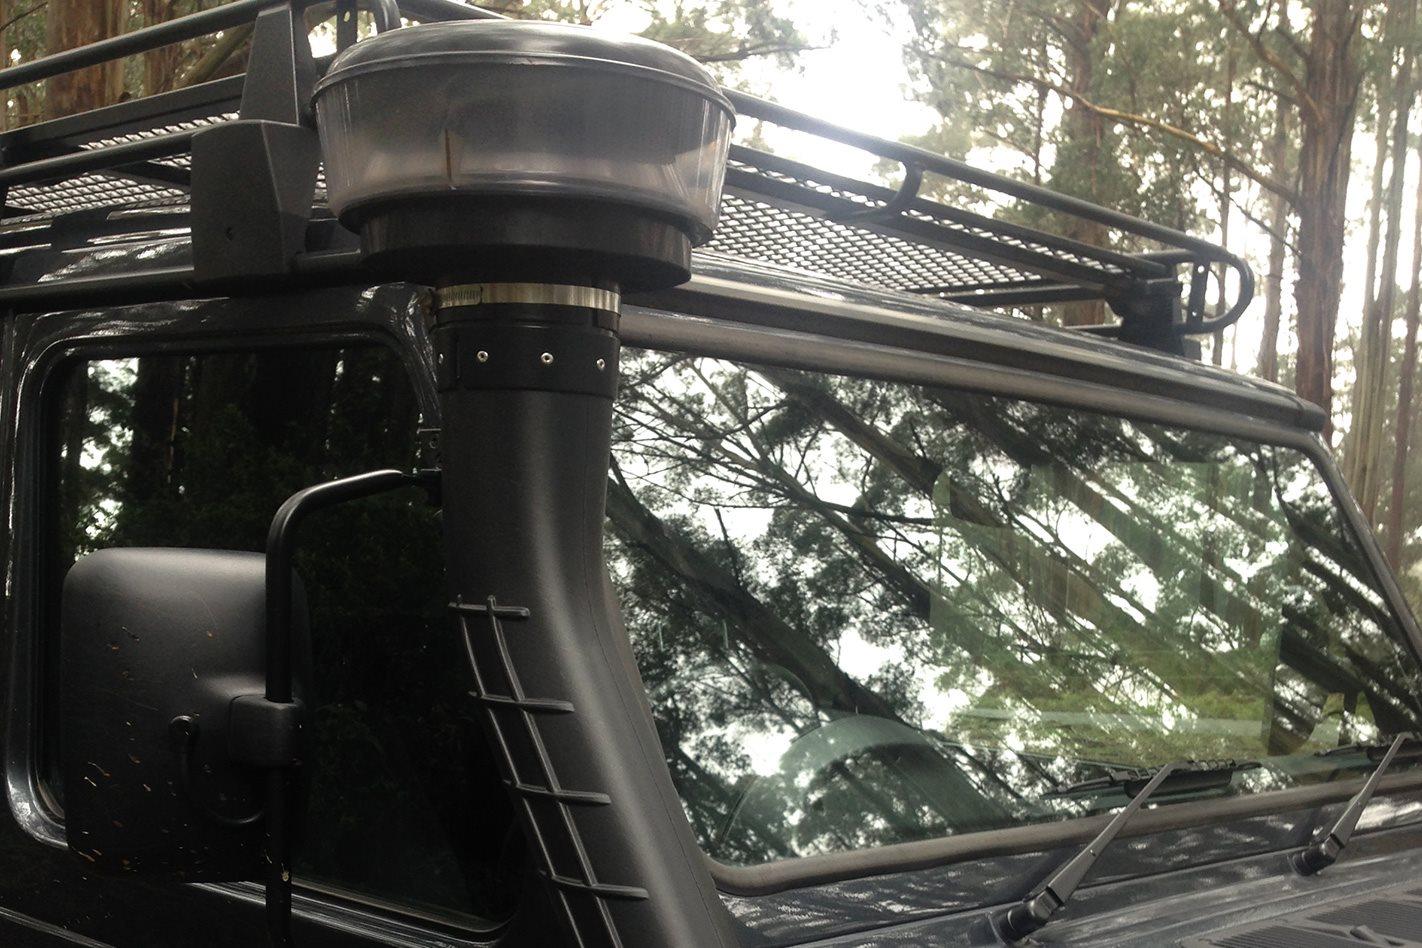 2017-Mercedes-Benz-G300-Professional-Snorkel.jpg